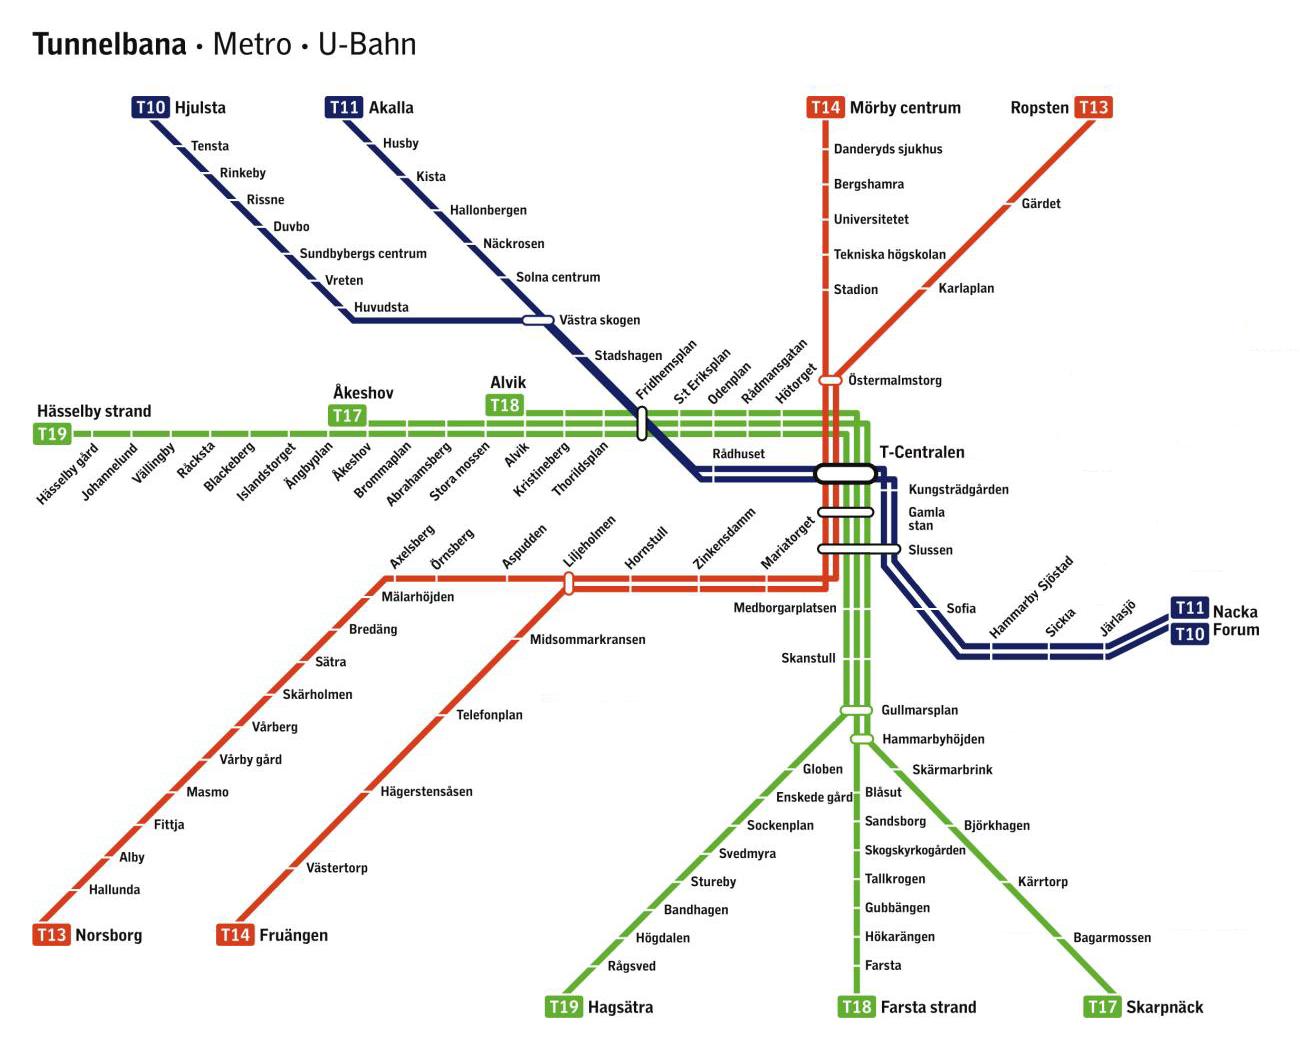 Sthlm Tunnelbanekarta Sa Har Stockholms Tunnelbana Vaxt